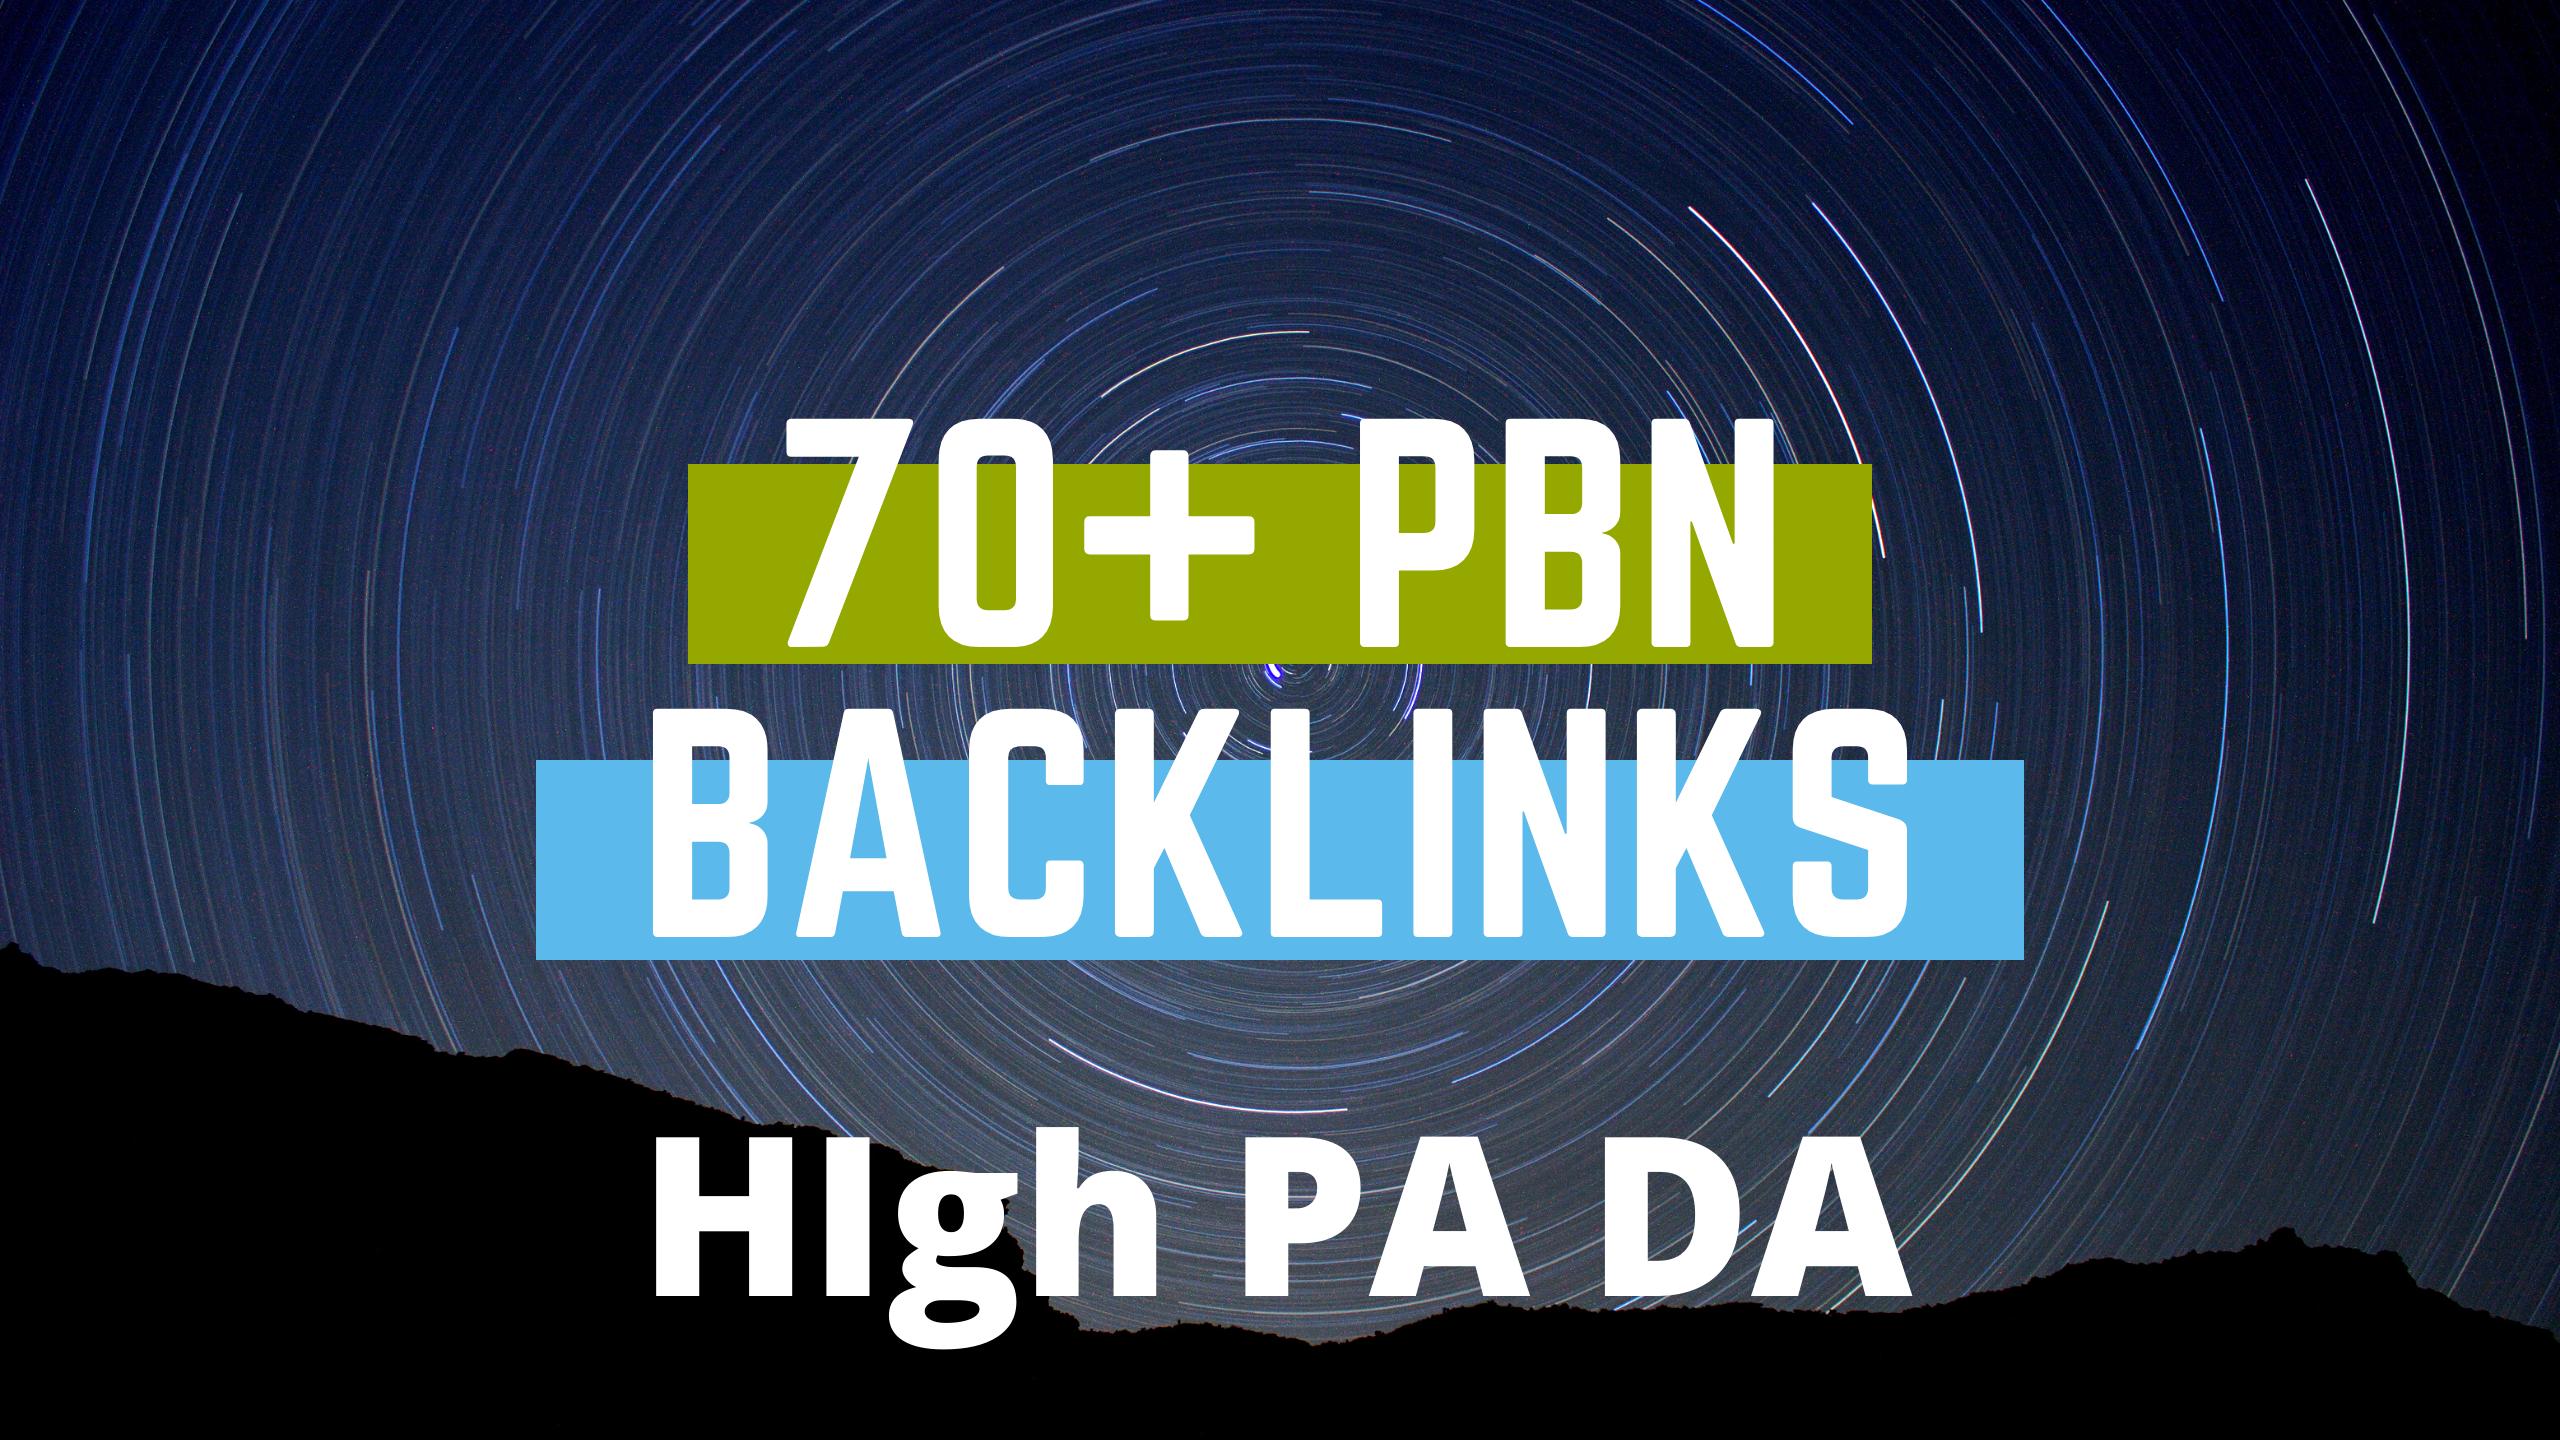 70 PBN Backlinks High PA DA and Blogger Backlink to get fast rankup